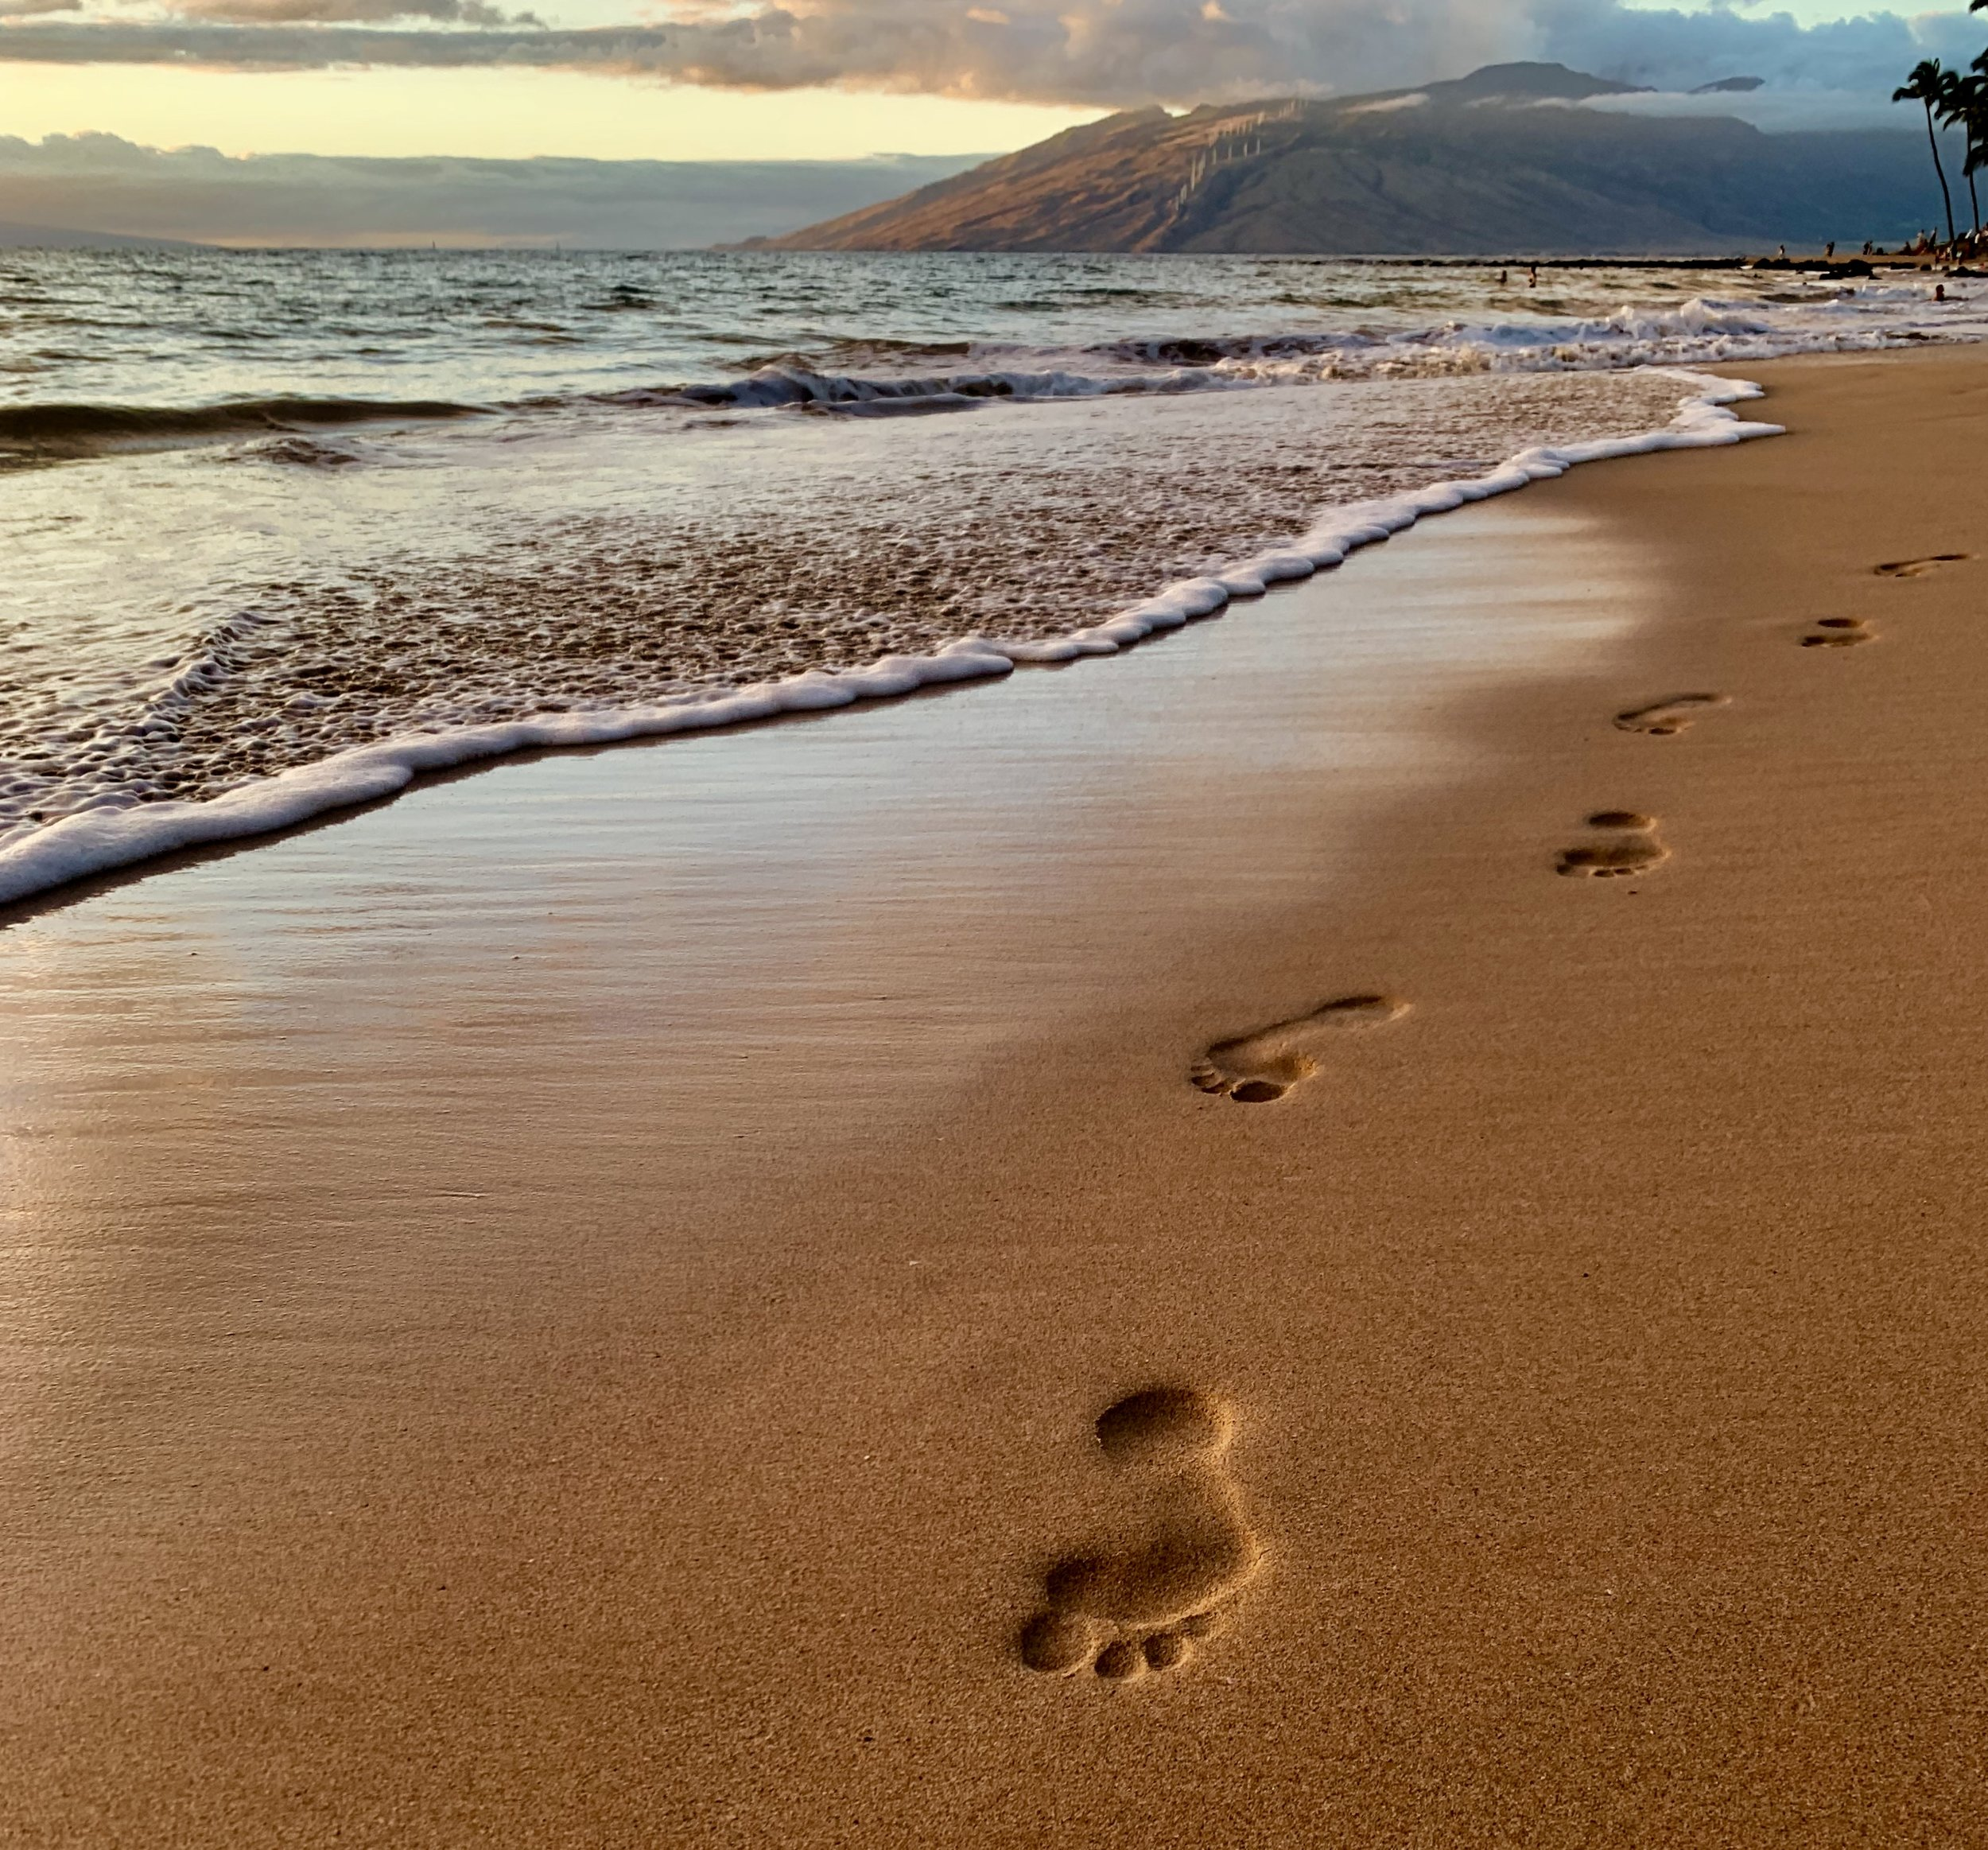 Blue_Soul_Maui_Beach_Footsteps.jpg